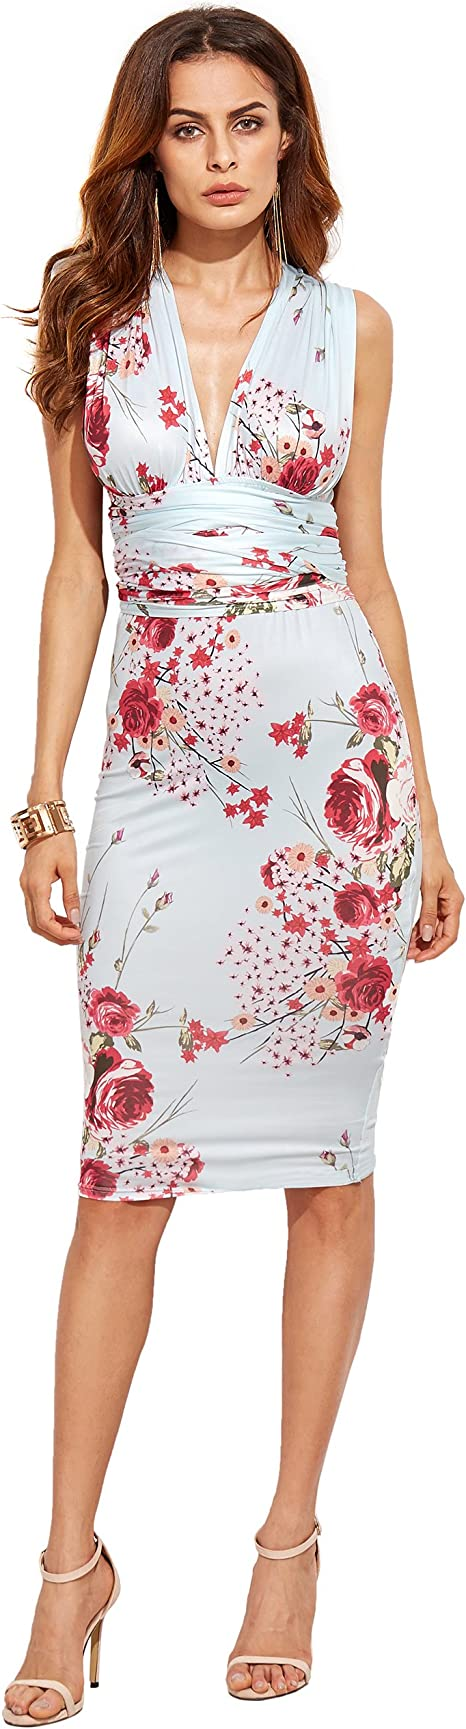 SheIn Damen Etui Kleid Gr. S, mehrfarbig: Amazon.de: Bekleidung